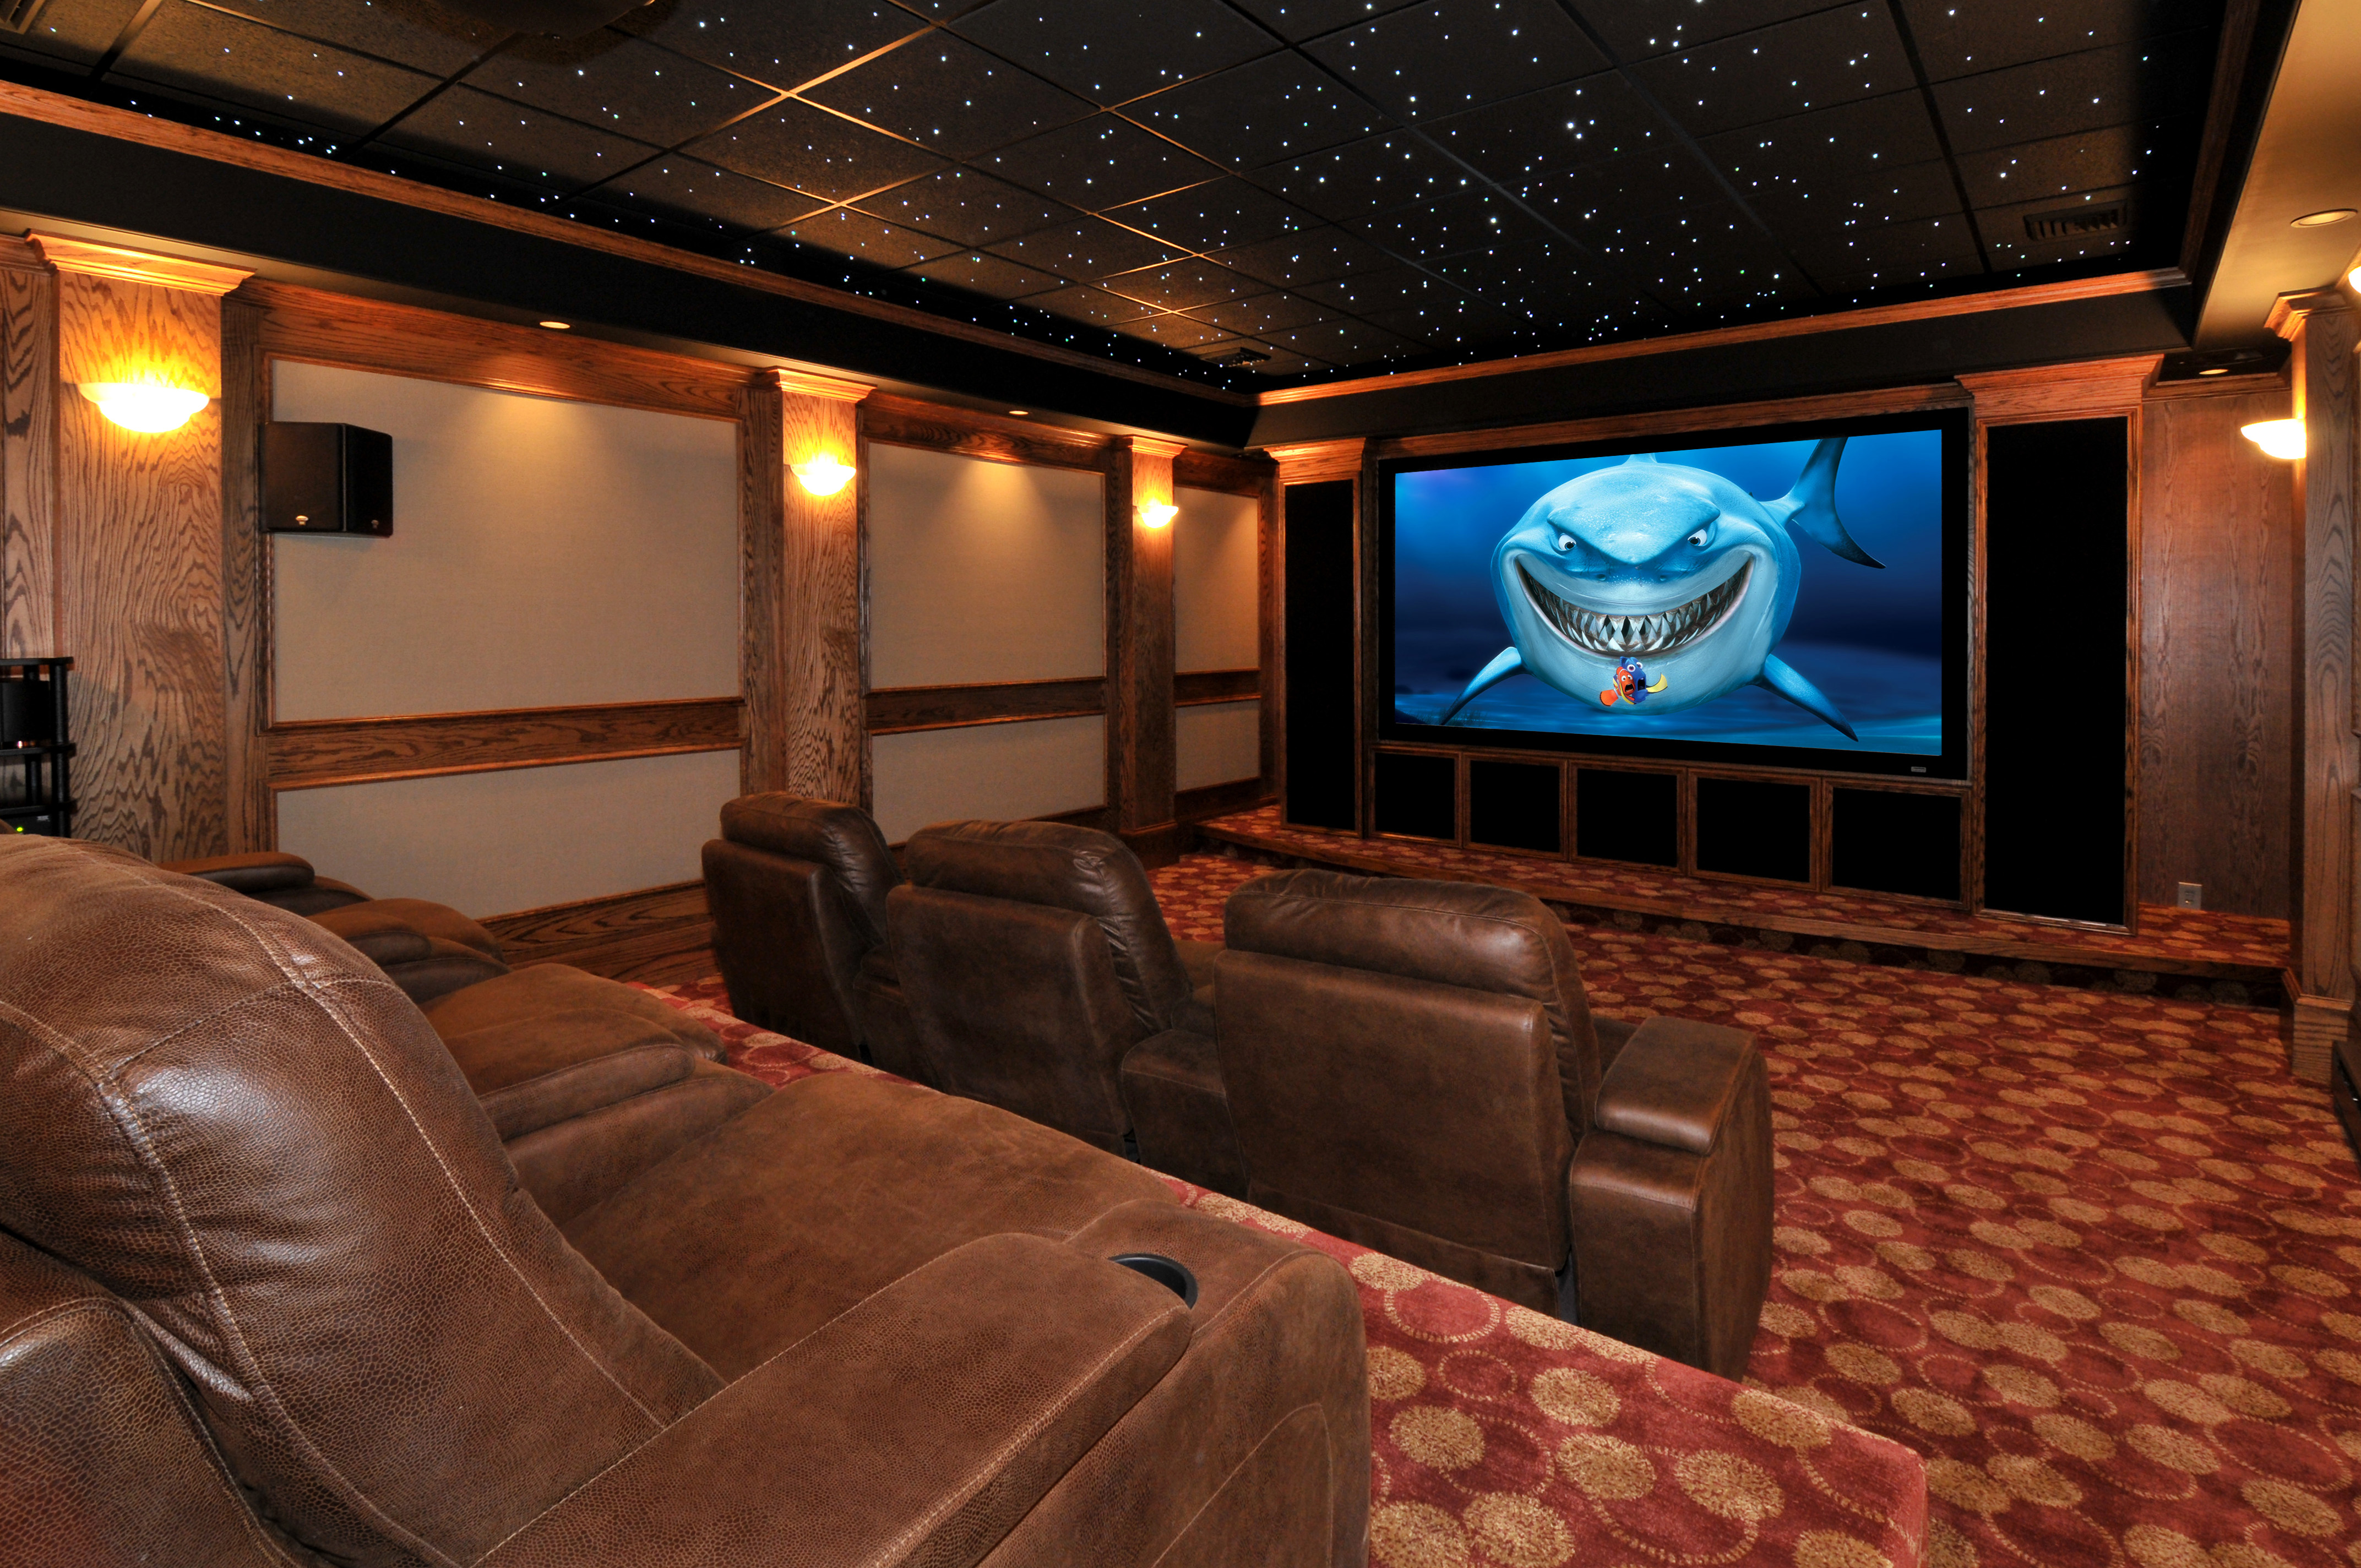 Ing Media Room Carpet Ideas Of Decorations Wall Decor Movie Interior Design Rukle Acnn Decor